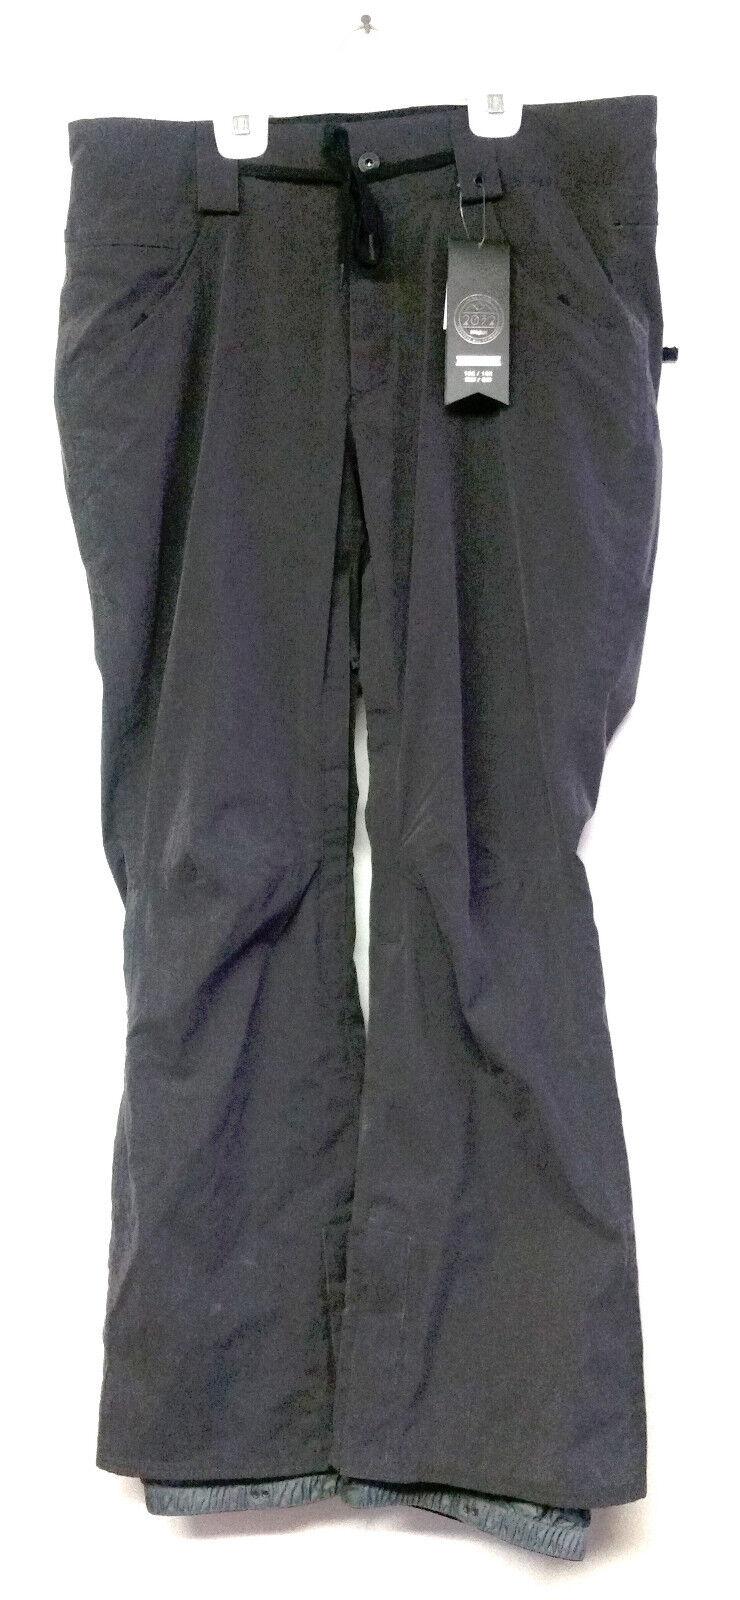 THIRTYTWO Men's WOODERSON Snow Pants - Black Wash - XL - NWT